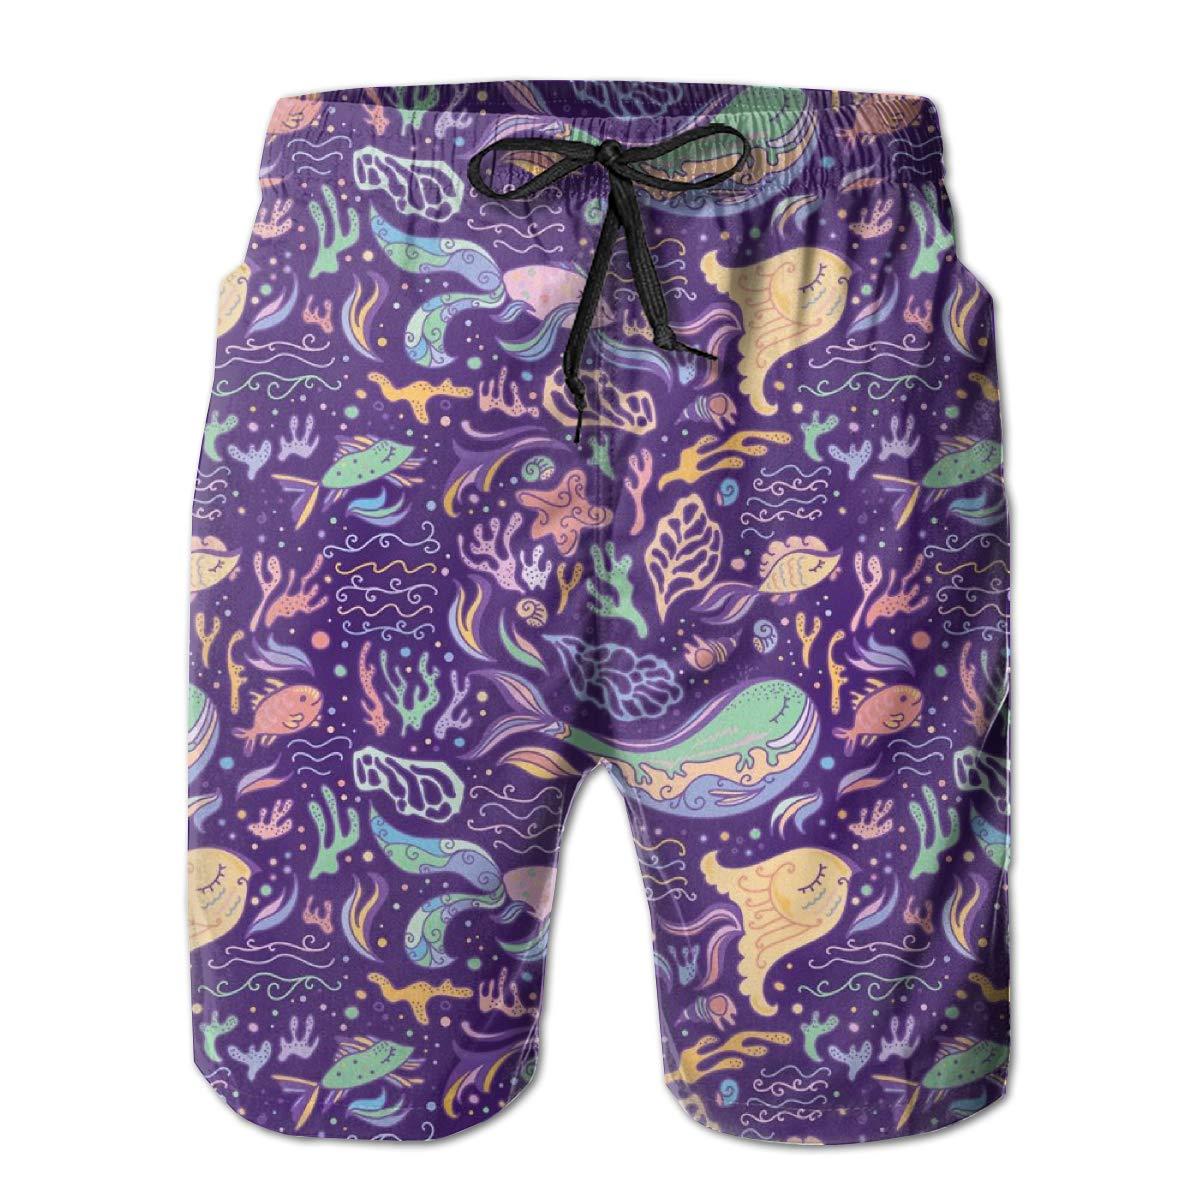 SARA NELL Mens Swim Trunks Purple Sea Pattern Surfing Beach Board Shorts Swimwear